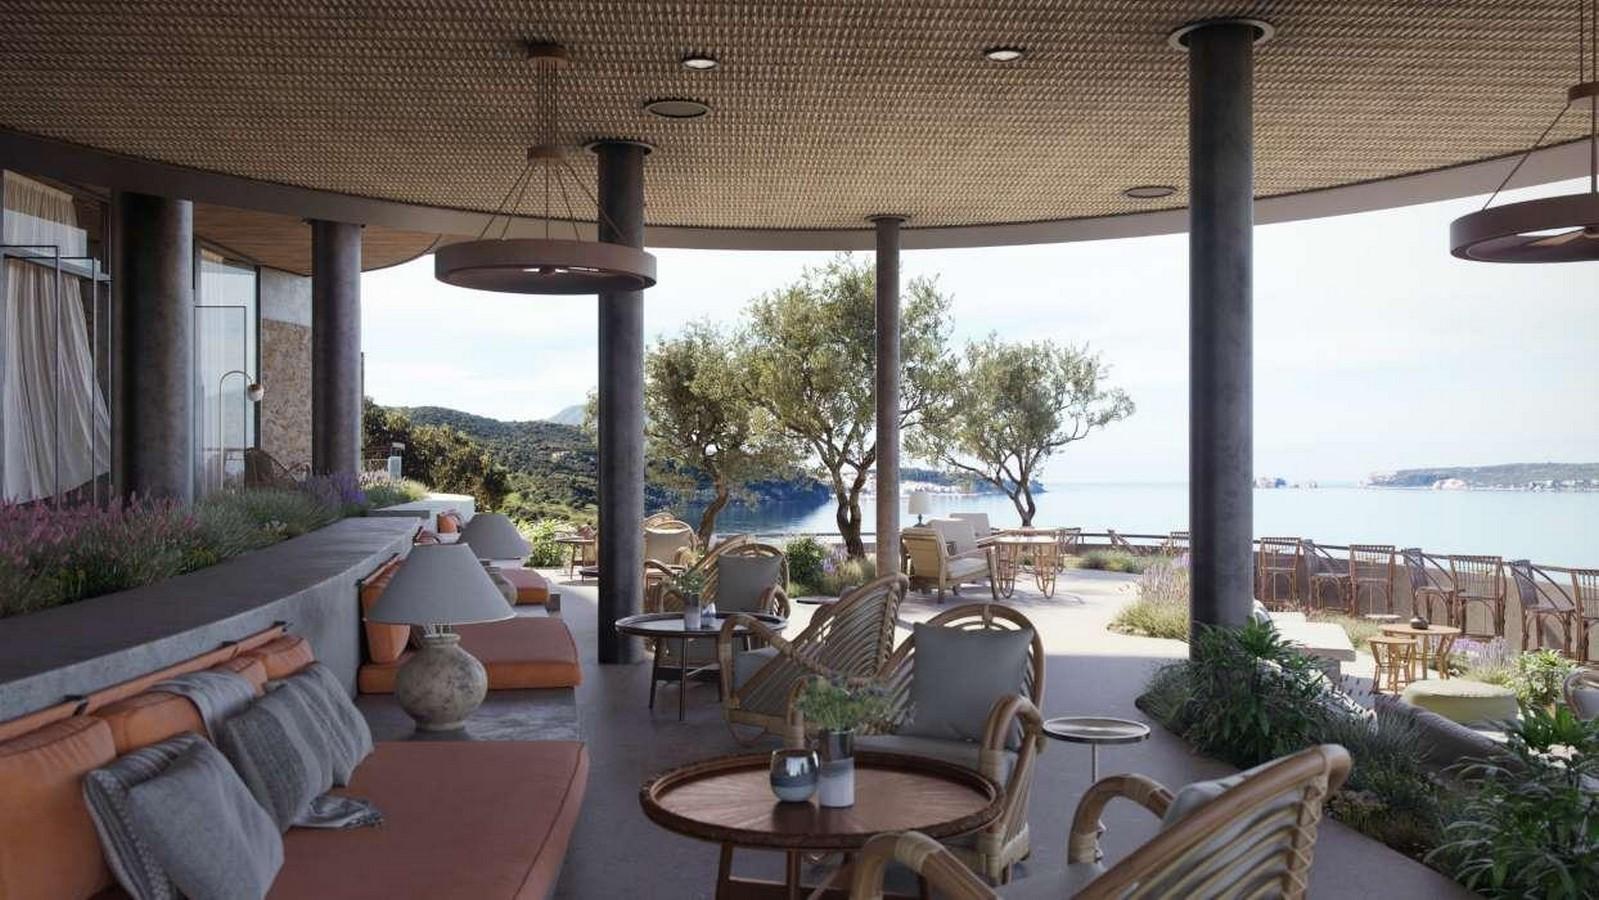 Costa Navarino, Greece - Sheet3